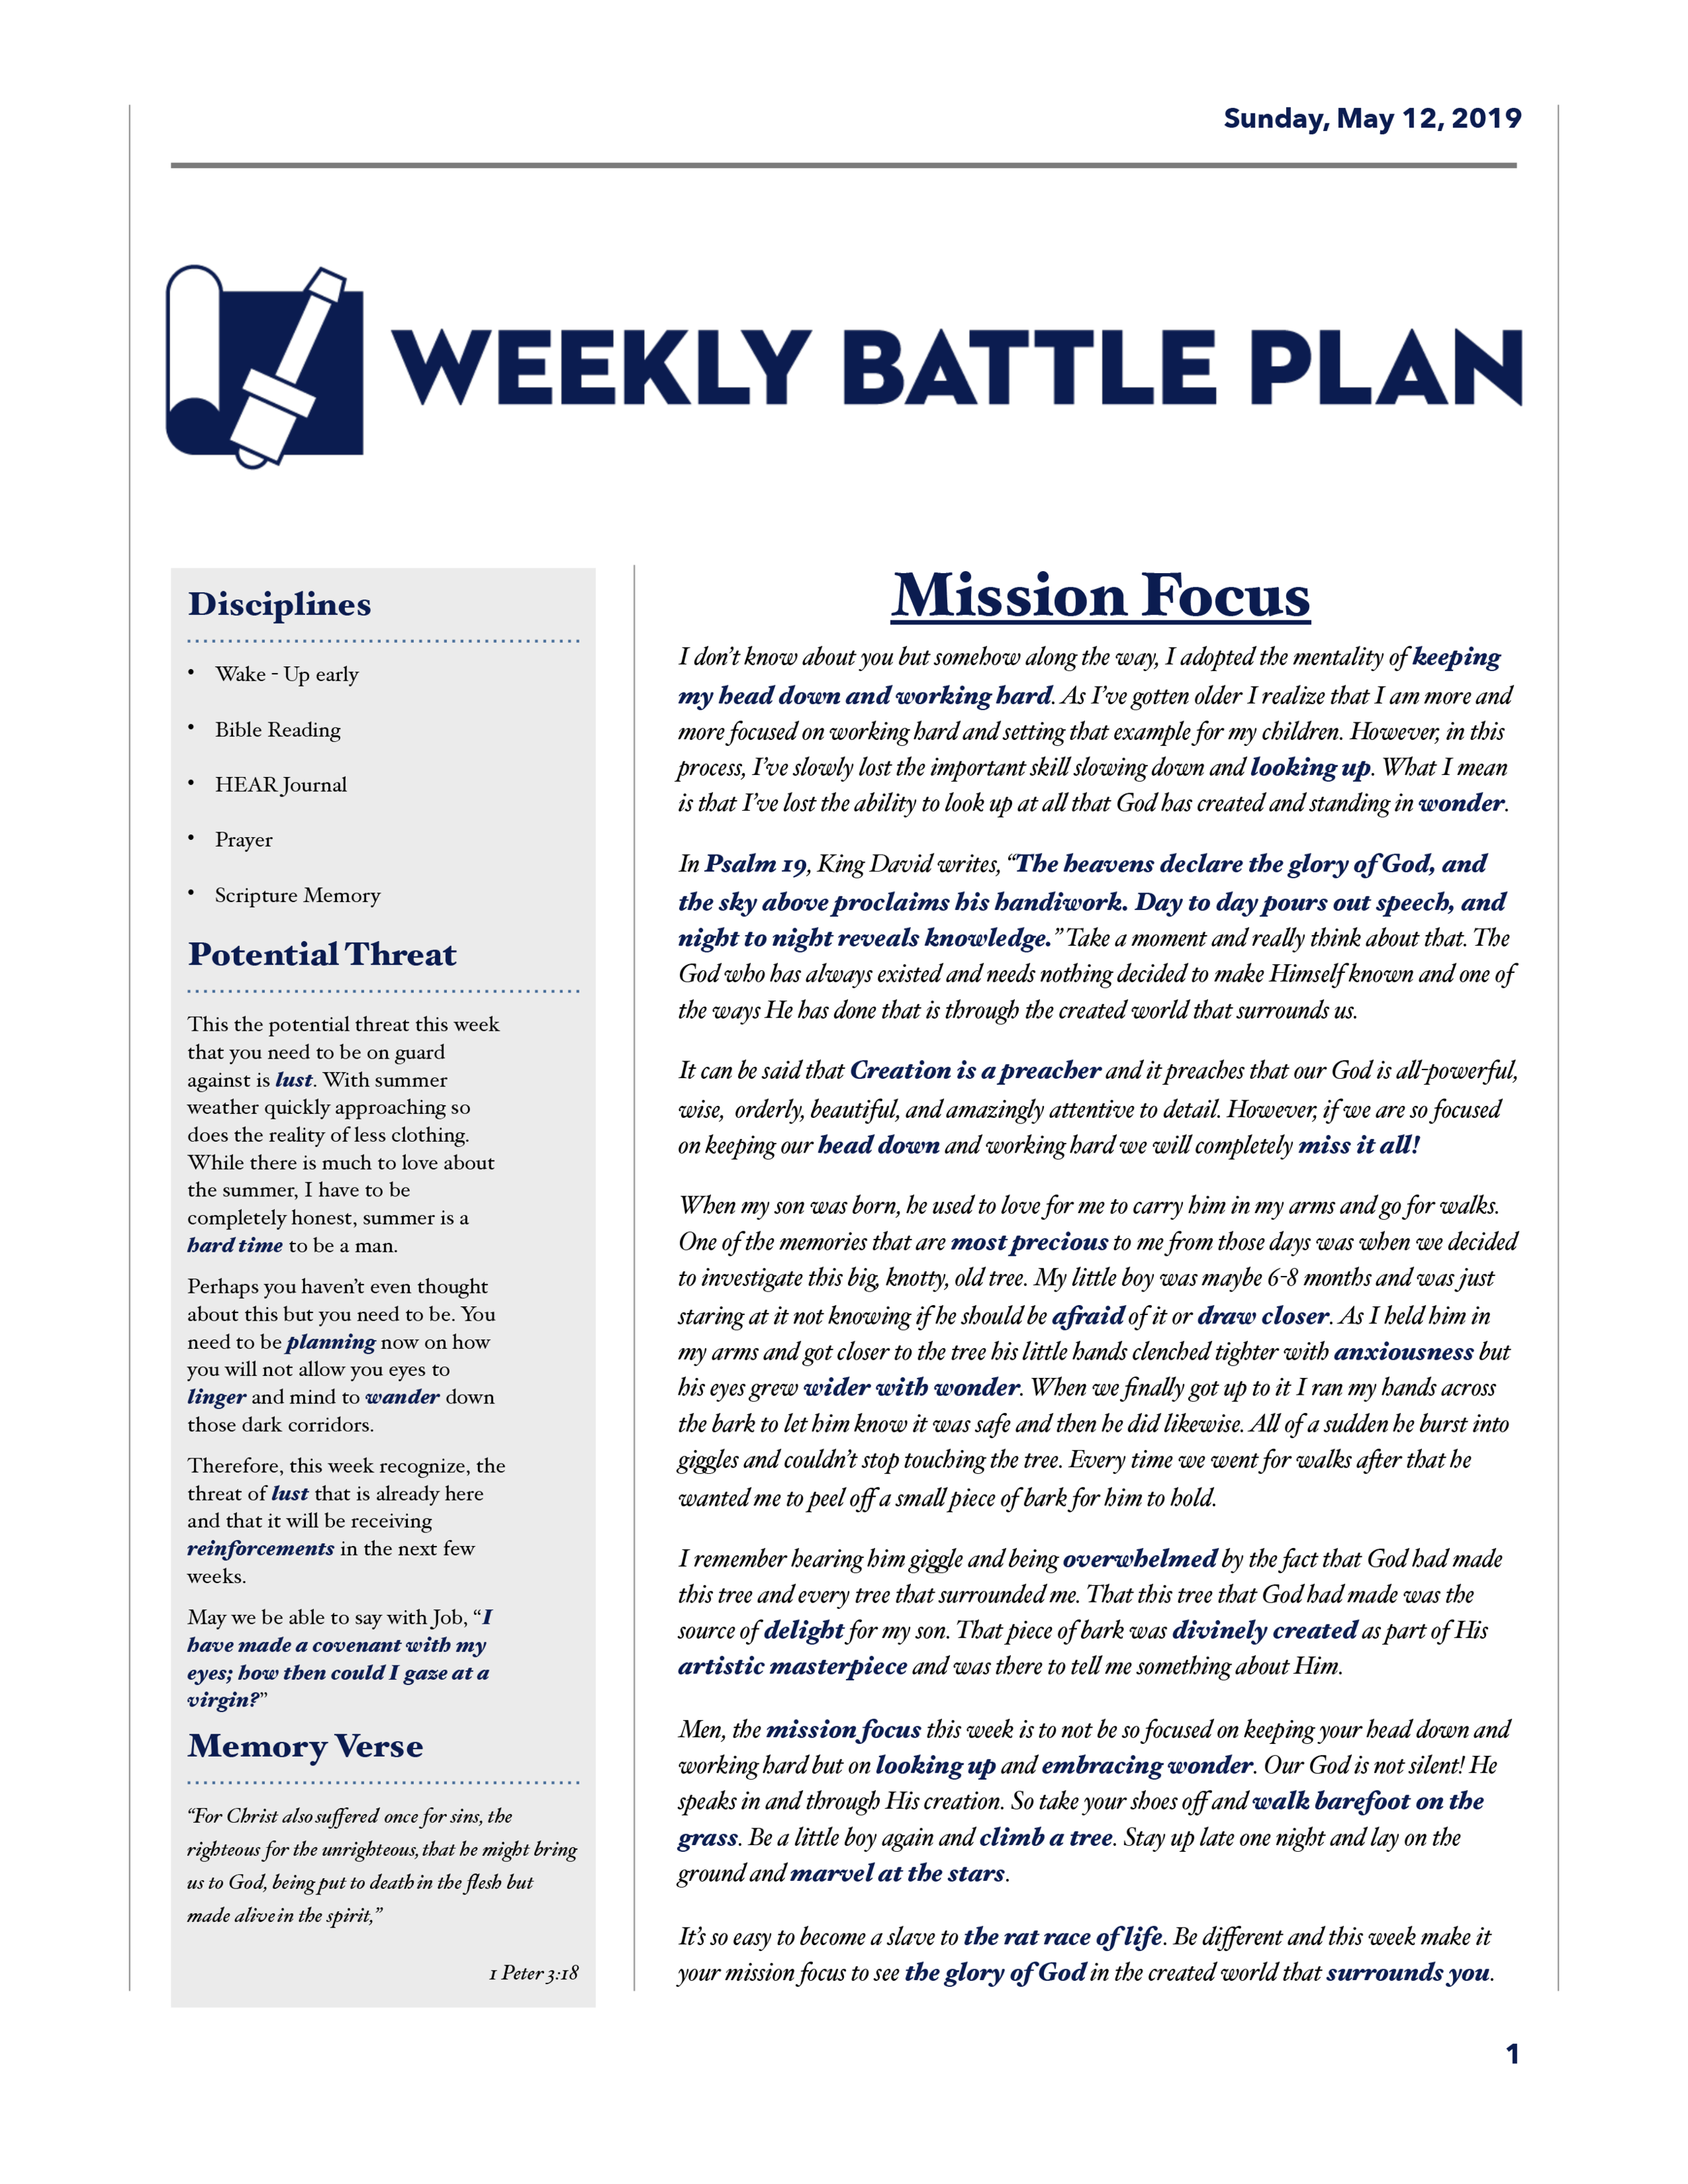 Battle Plan 5.12 -1.png